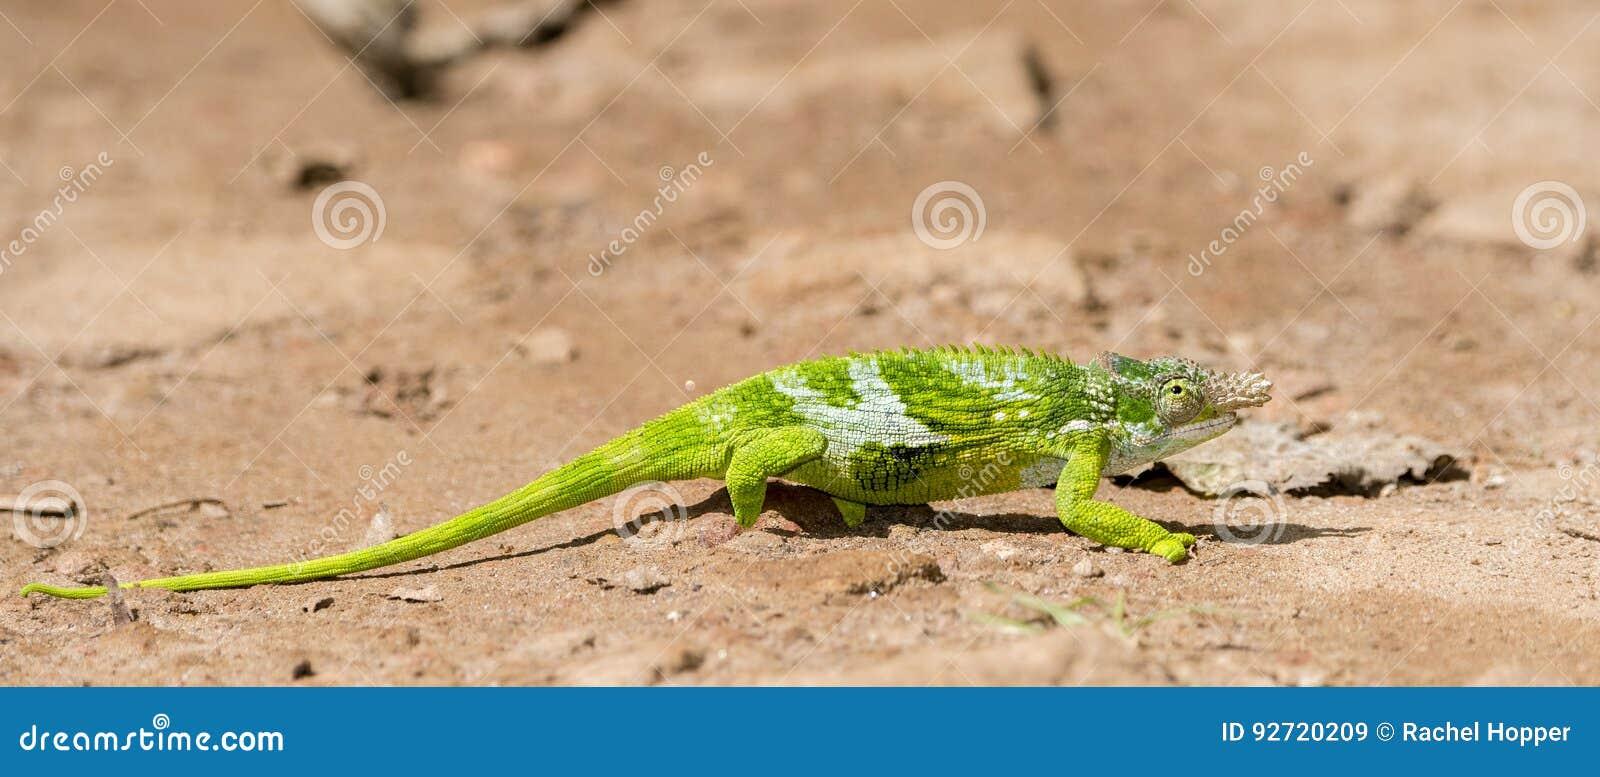 Der Endemic u. bedrohte Chamäleon Usambara Zwei-gehörntes Kinyongia-multituberculata in Tansania